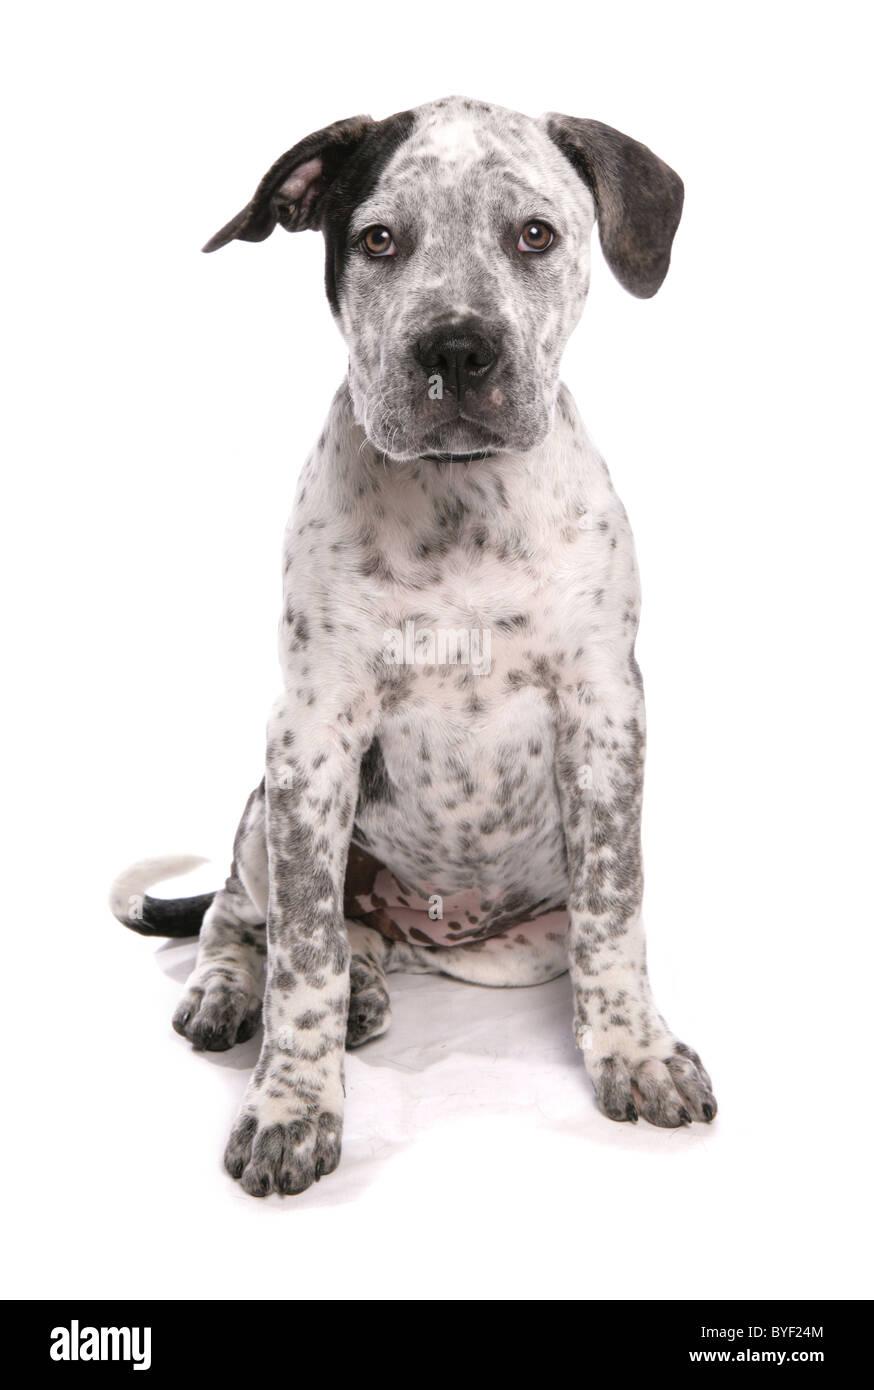 staffordshire bull terrier cross american bulldog puppy sitting studio - Stock Image